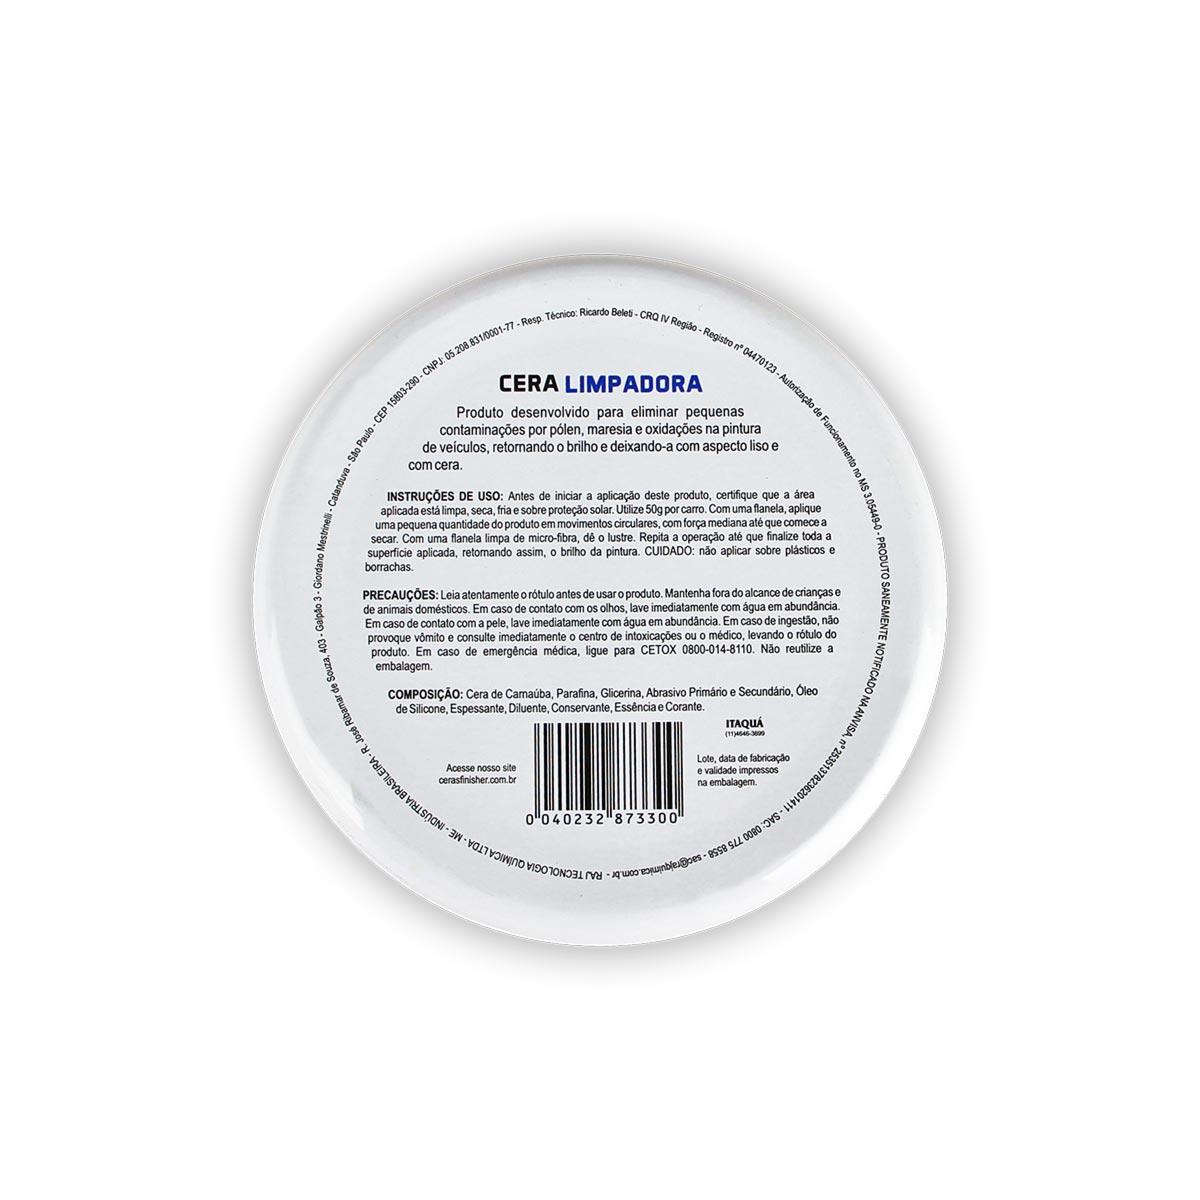 Cera Limpadora Automotiva Finisher 200g Cleaner wax limpa